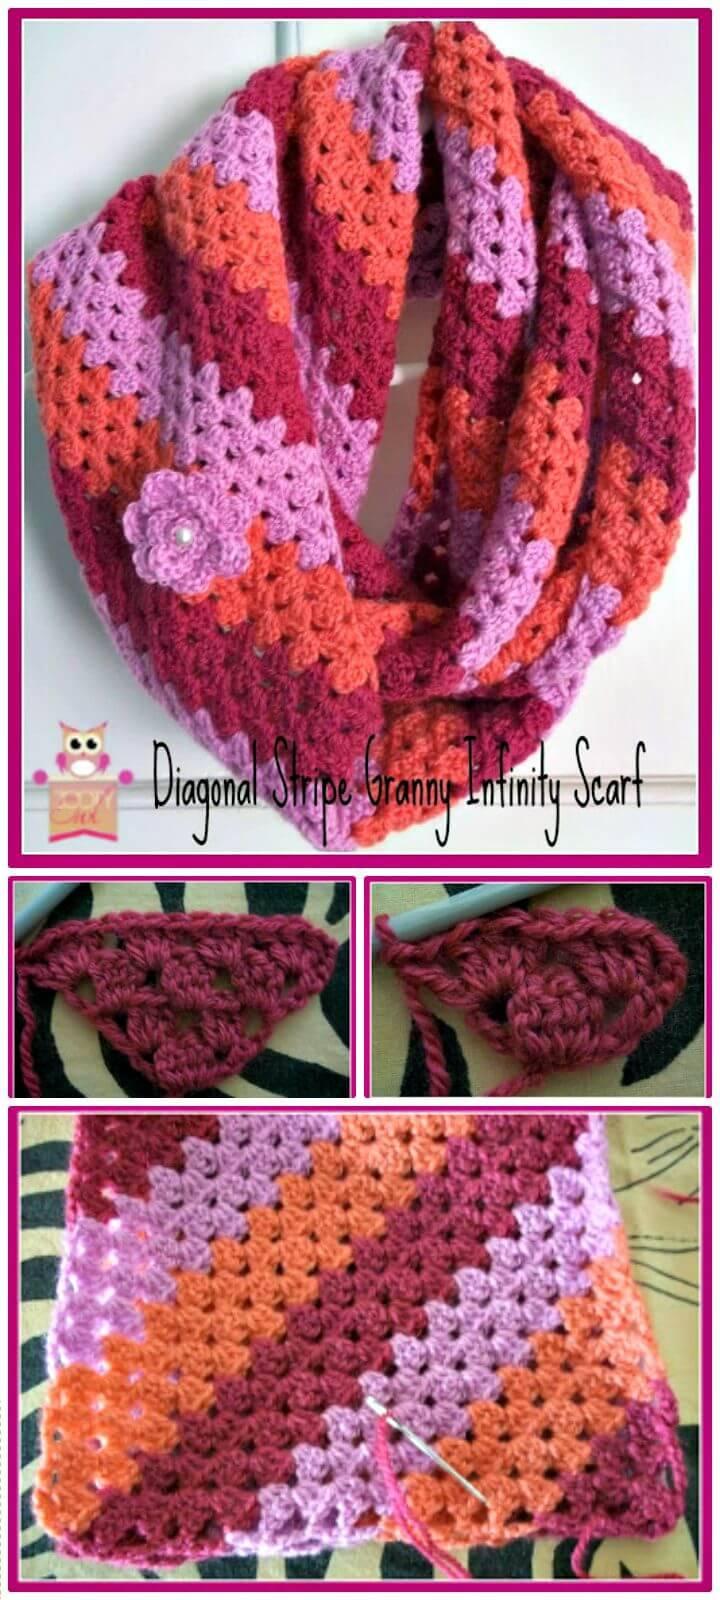 Free Crochet Infinity Scarf - Diagonal Granny Stripe Pattern